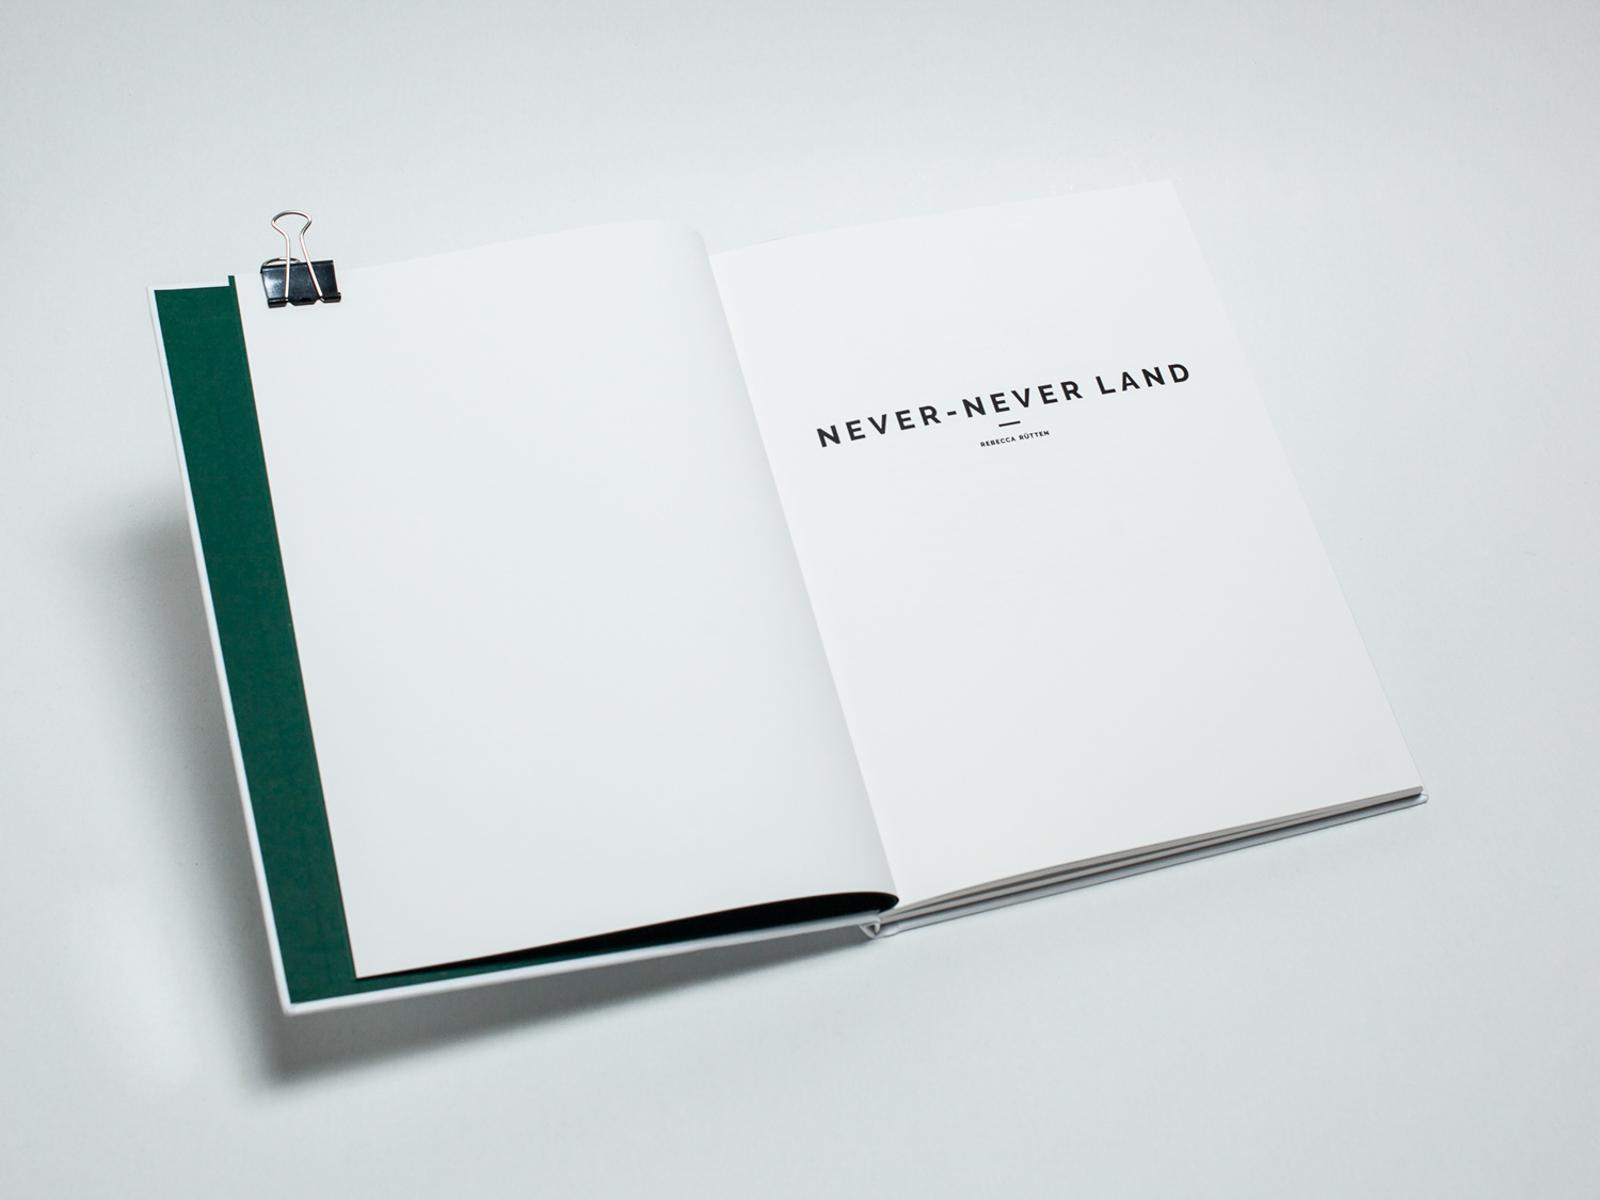 2019_RebeccaRuetten_Web_NeverNeverLand_book-14.jpg